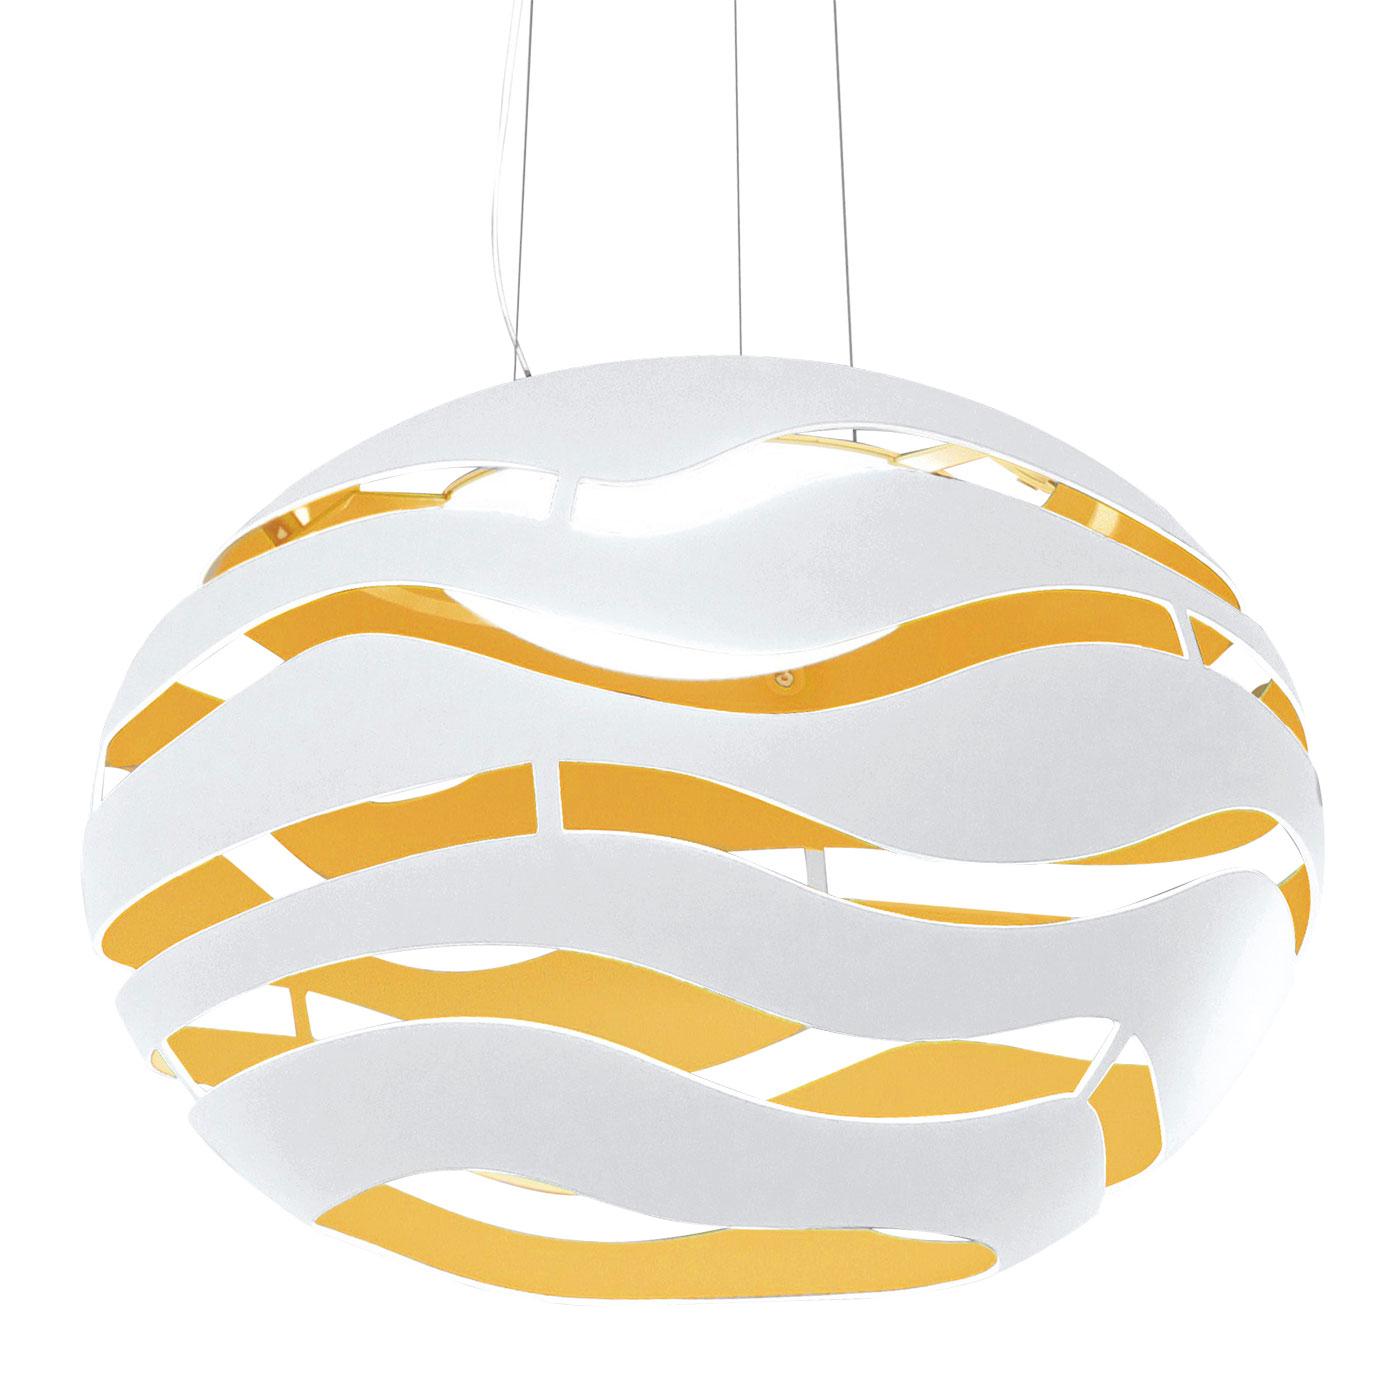 Tree Series S75 Lámpara Colgante LED 19,5W - Blanco interior dorado